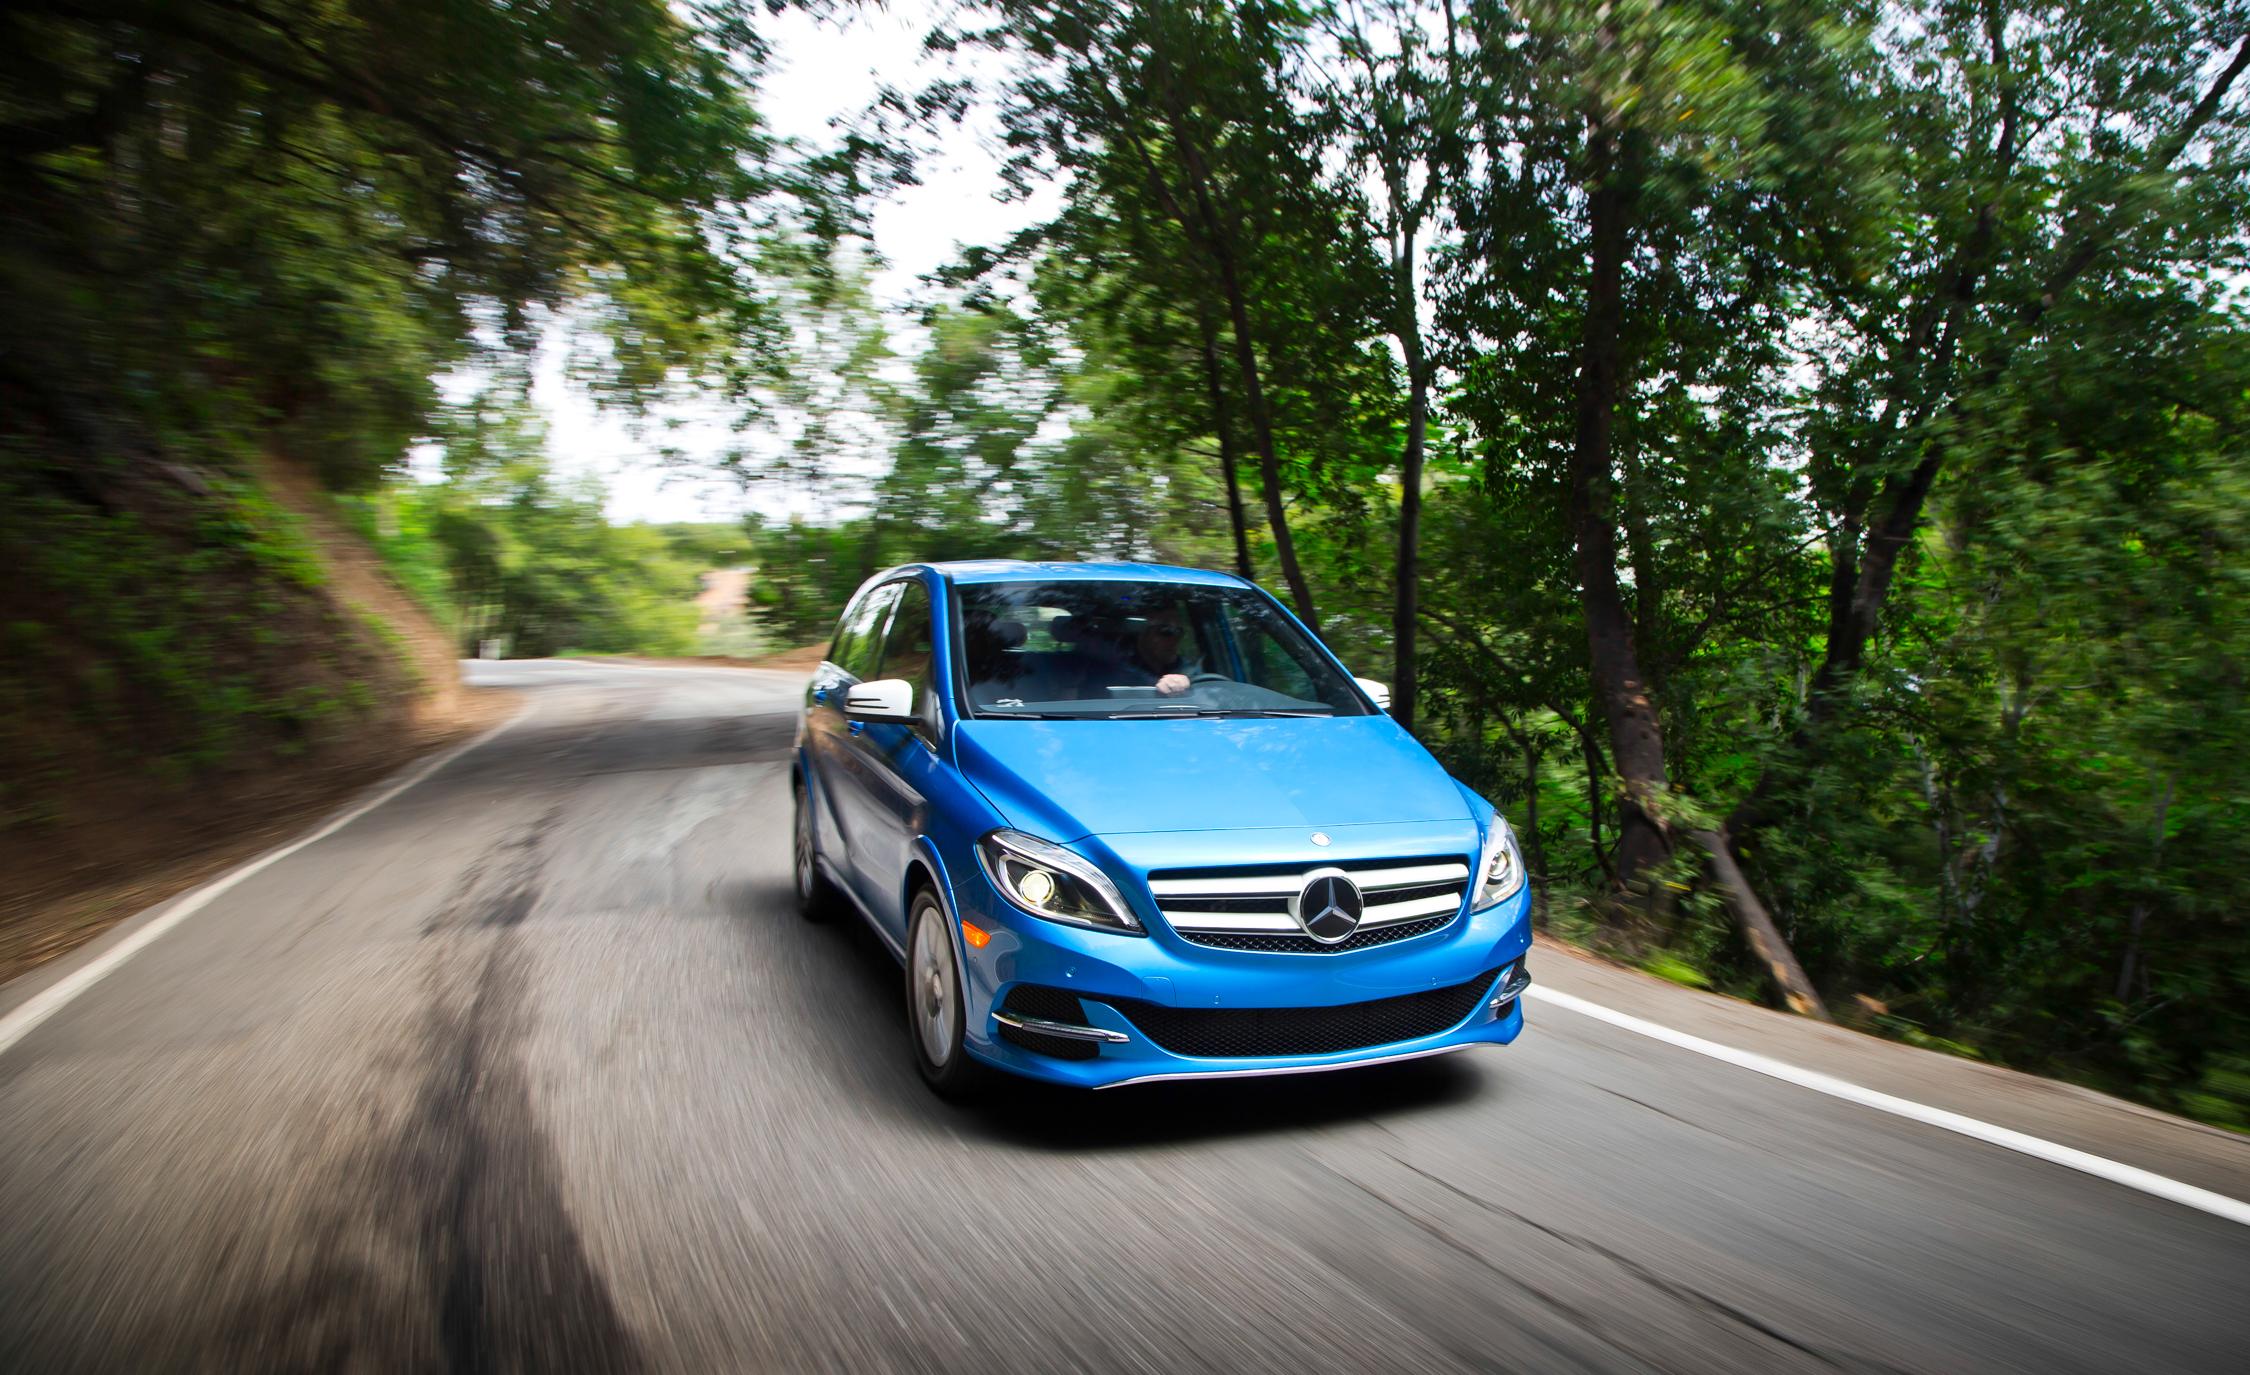 2014 Mercedes-Benz B-class Electric Drive Peformance